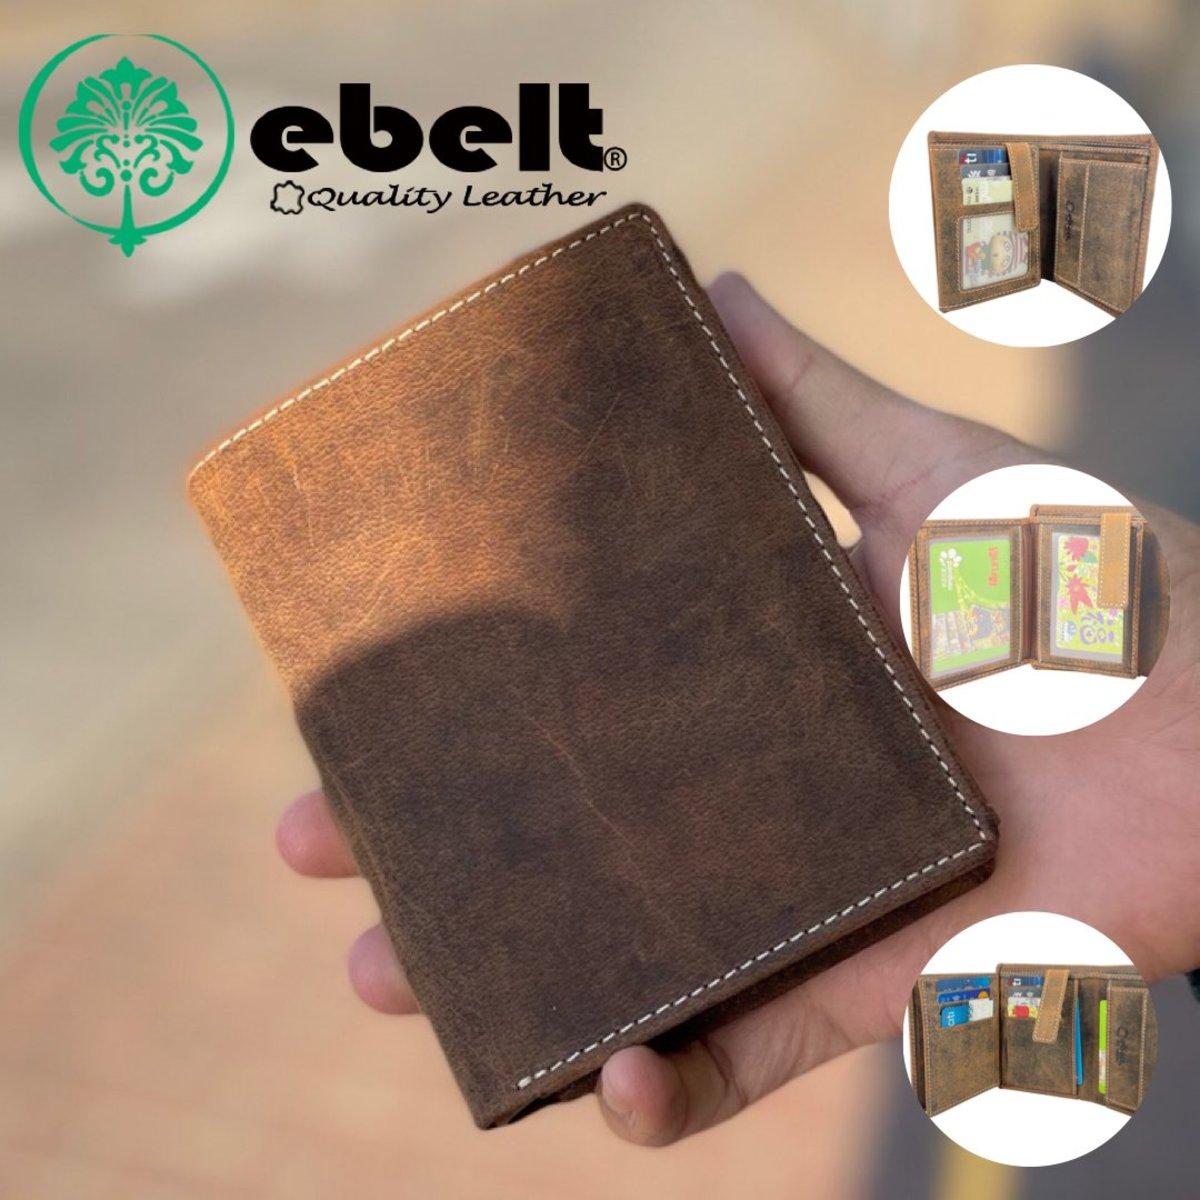 ebelt Full Grain Buffalo Hunter Series Leather Wallet - WM0137